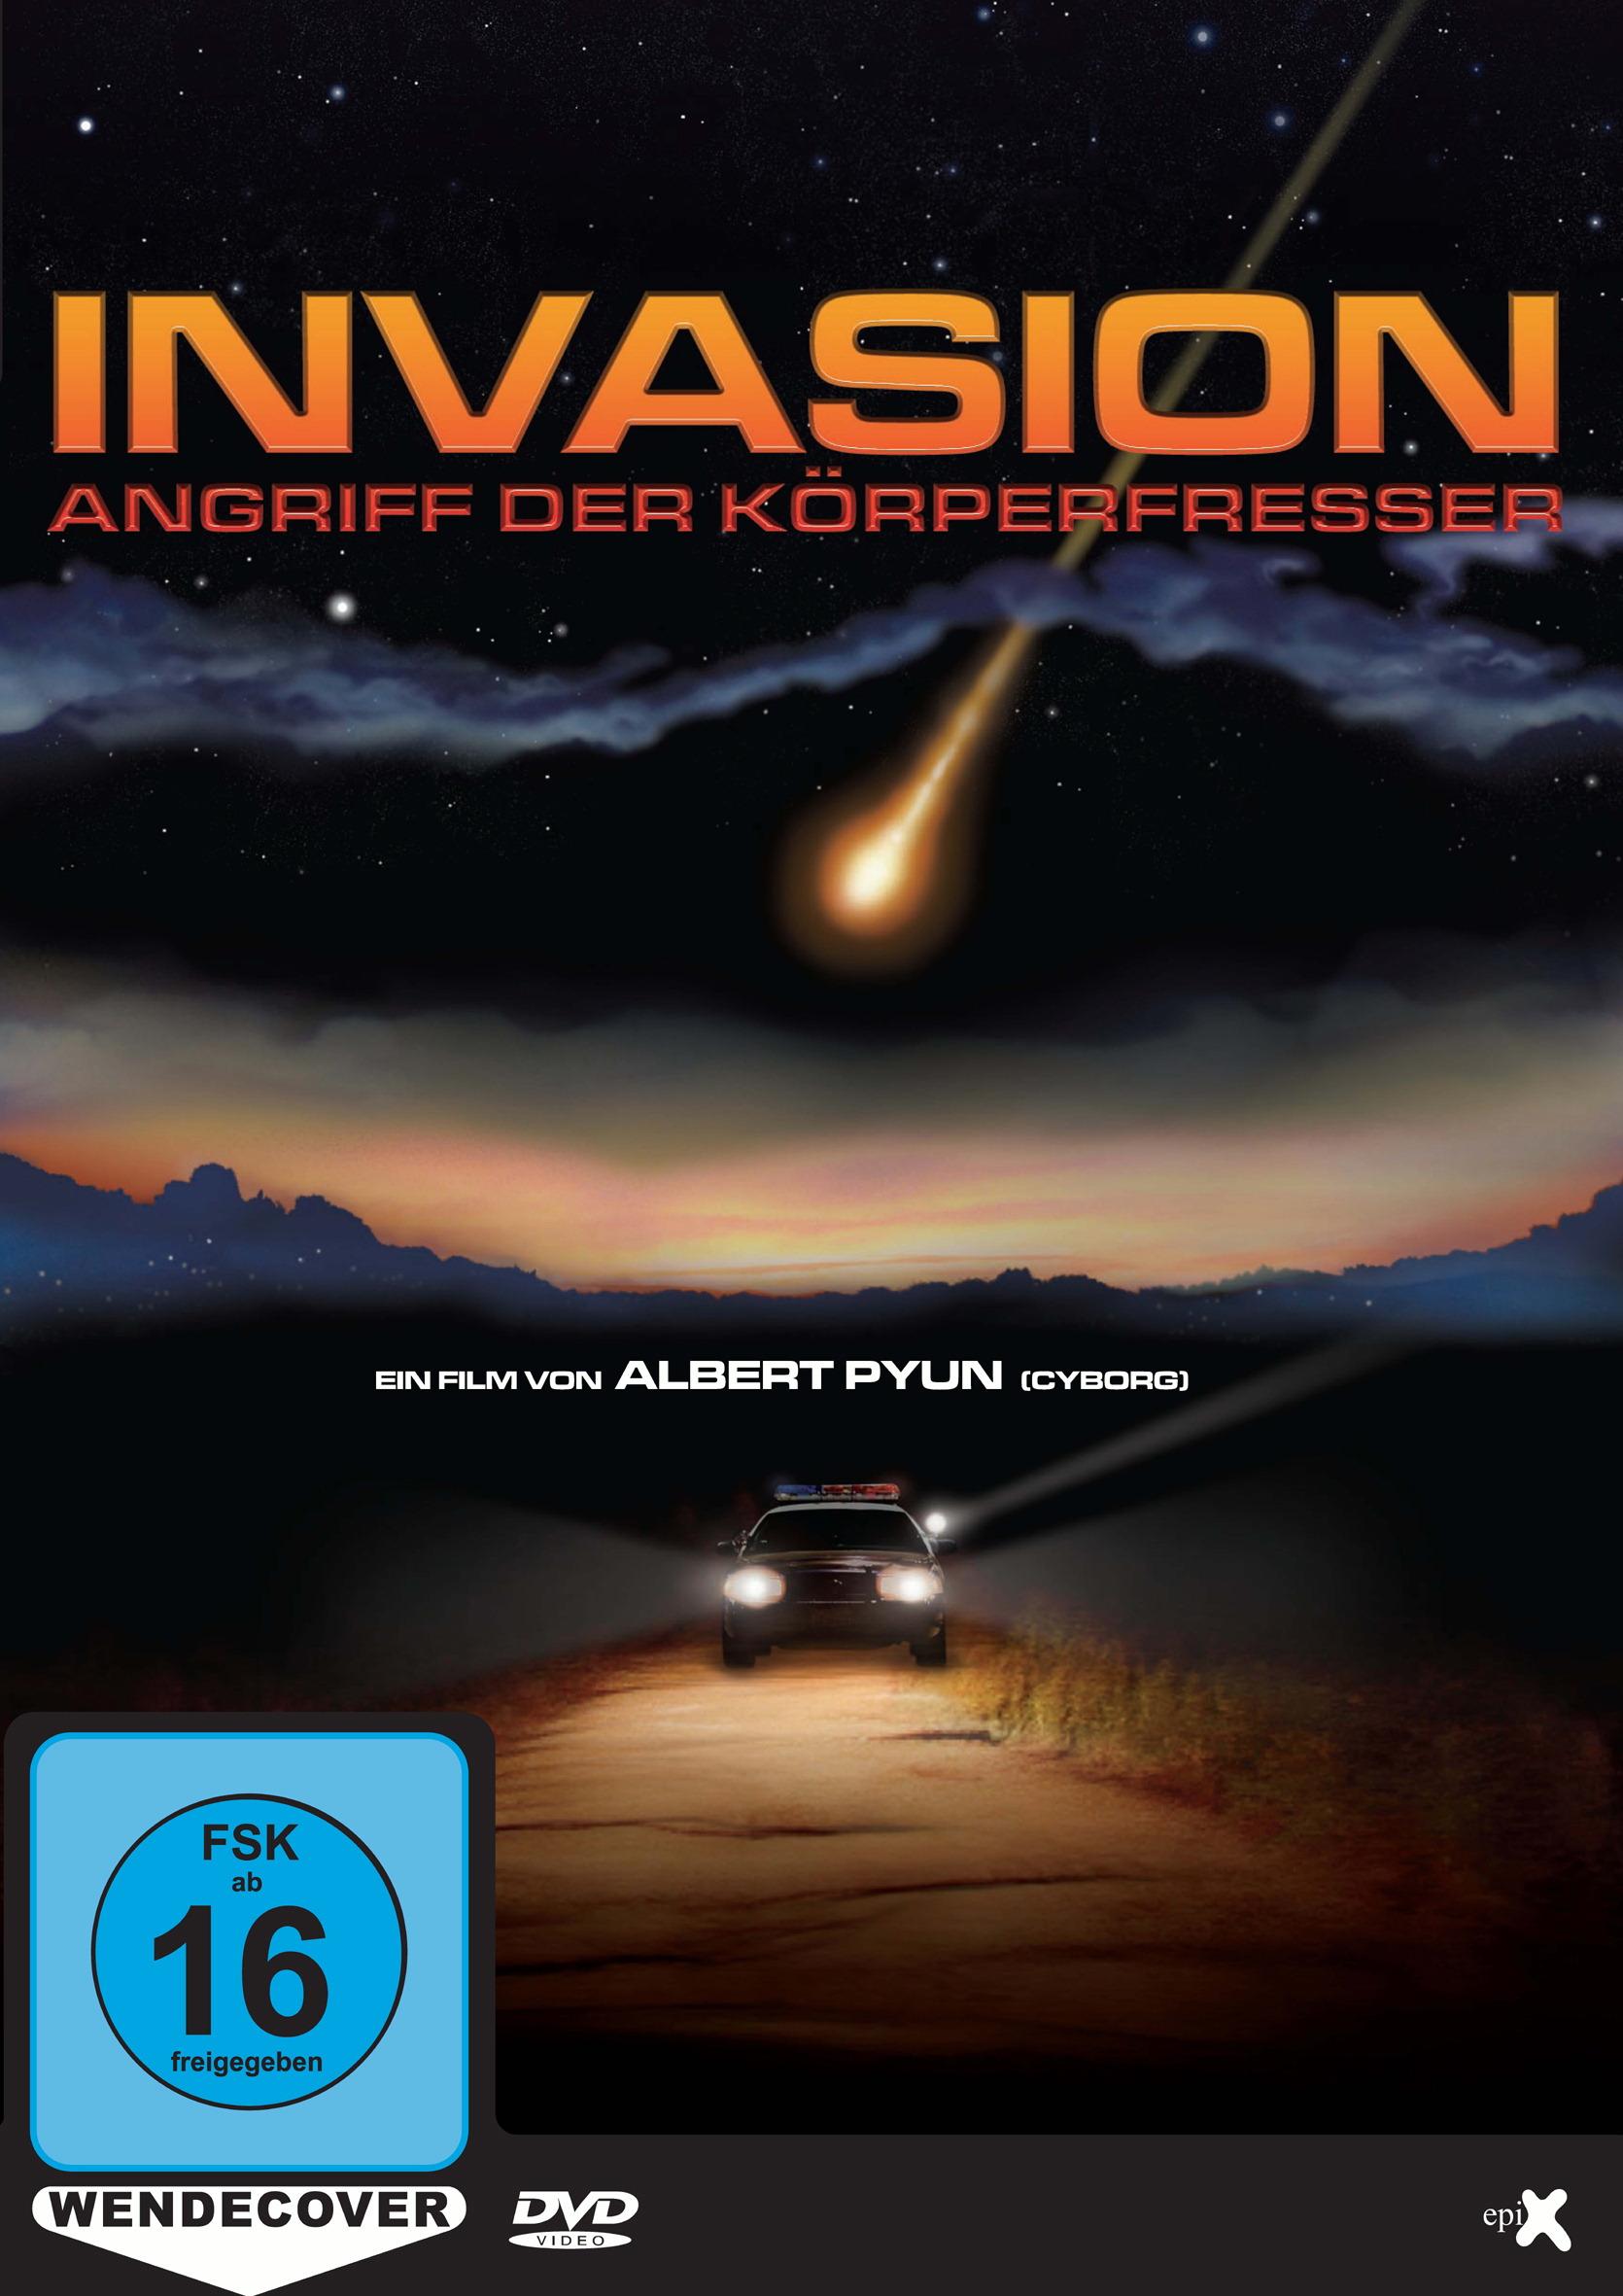 Invasion - Angriff der Körperfresser Poster